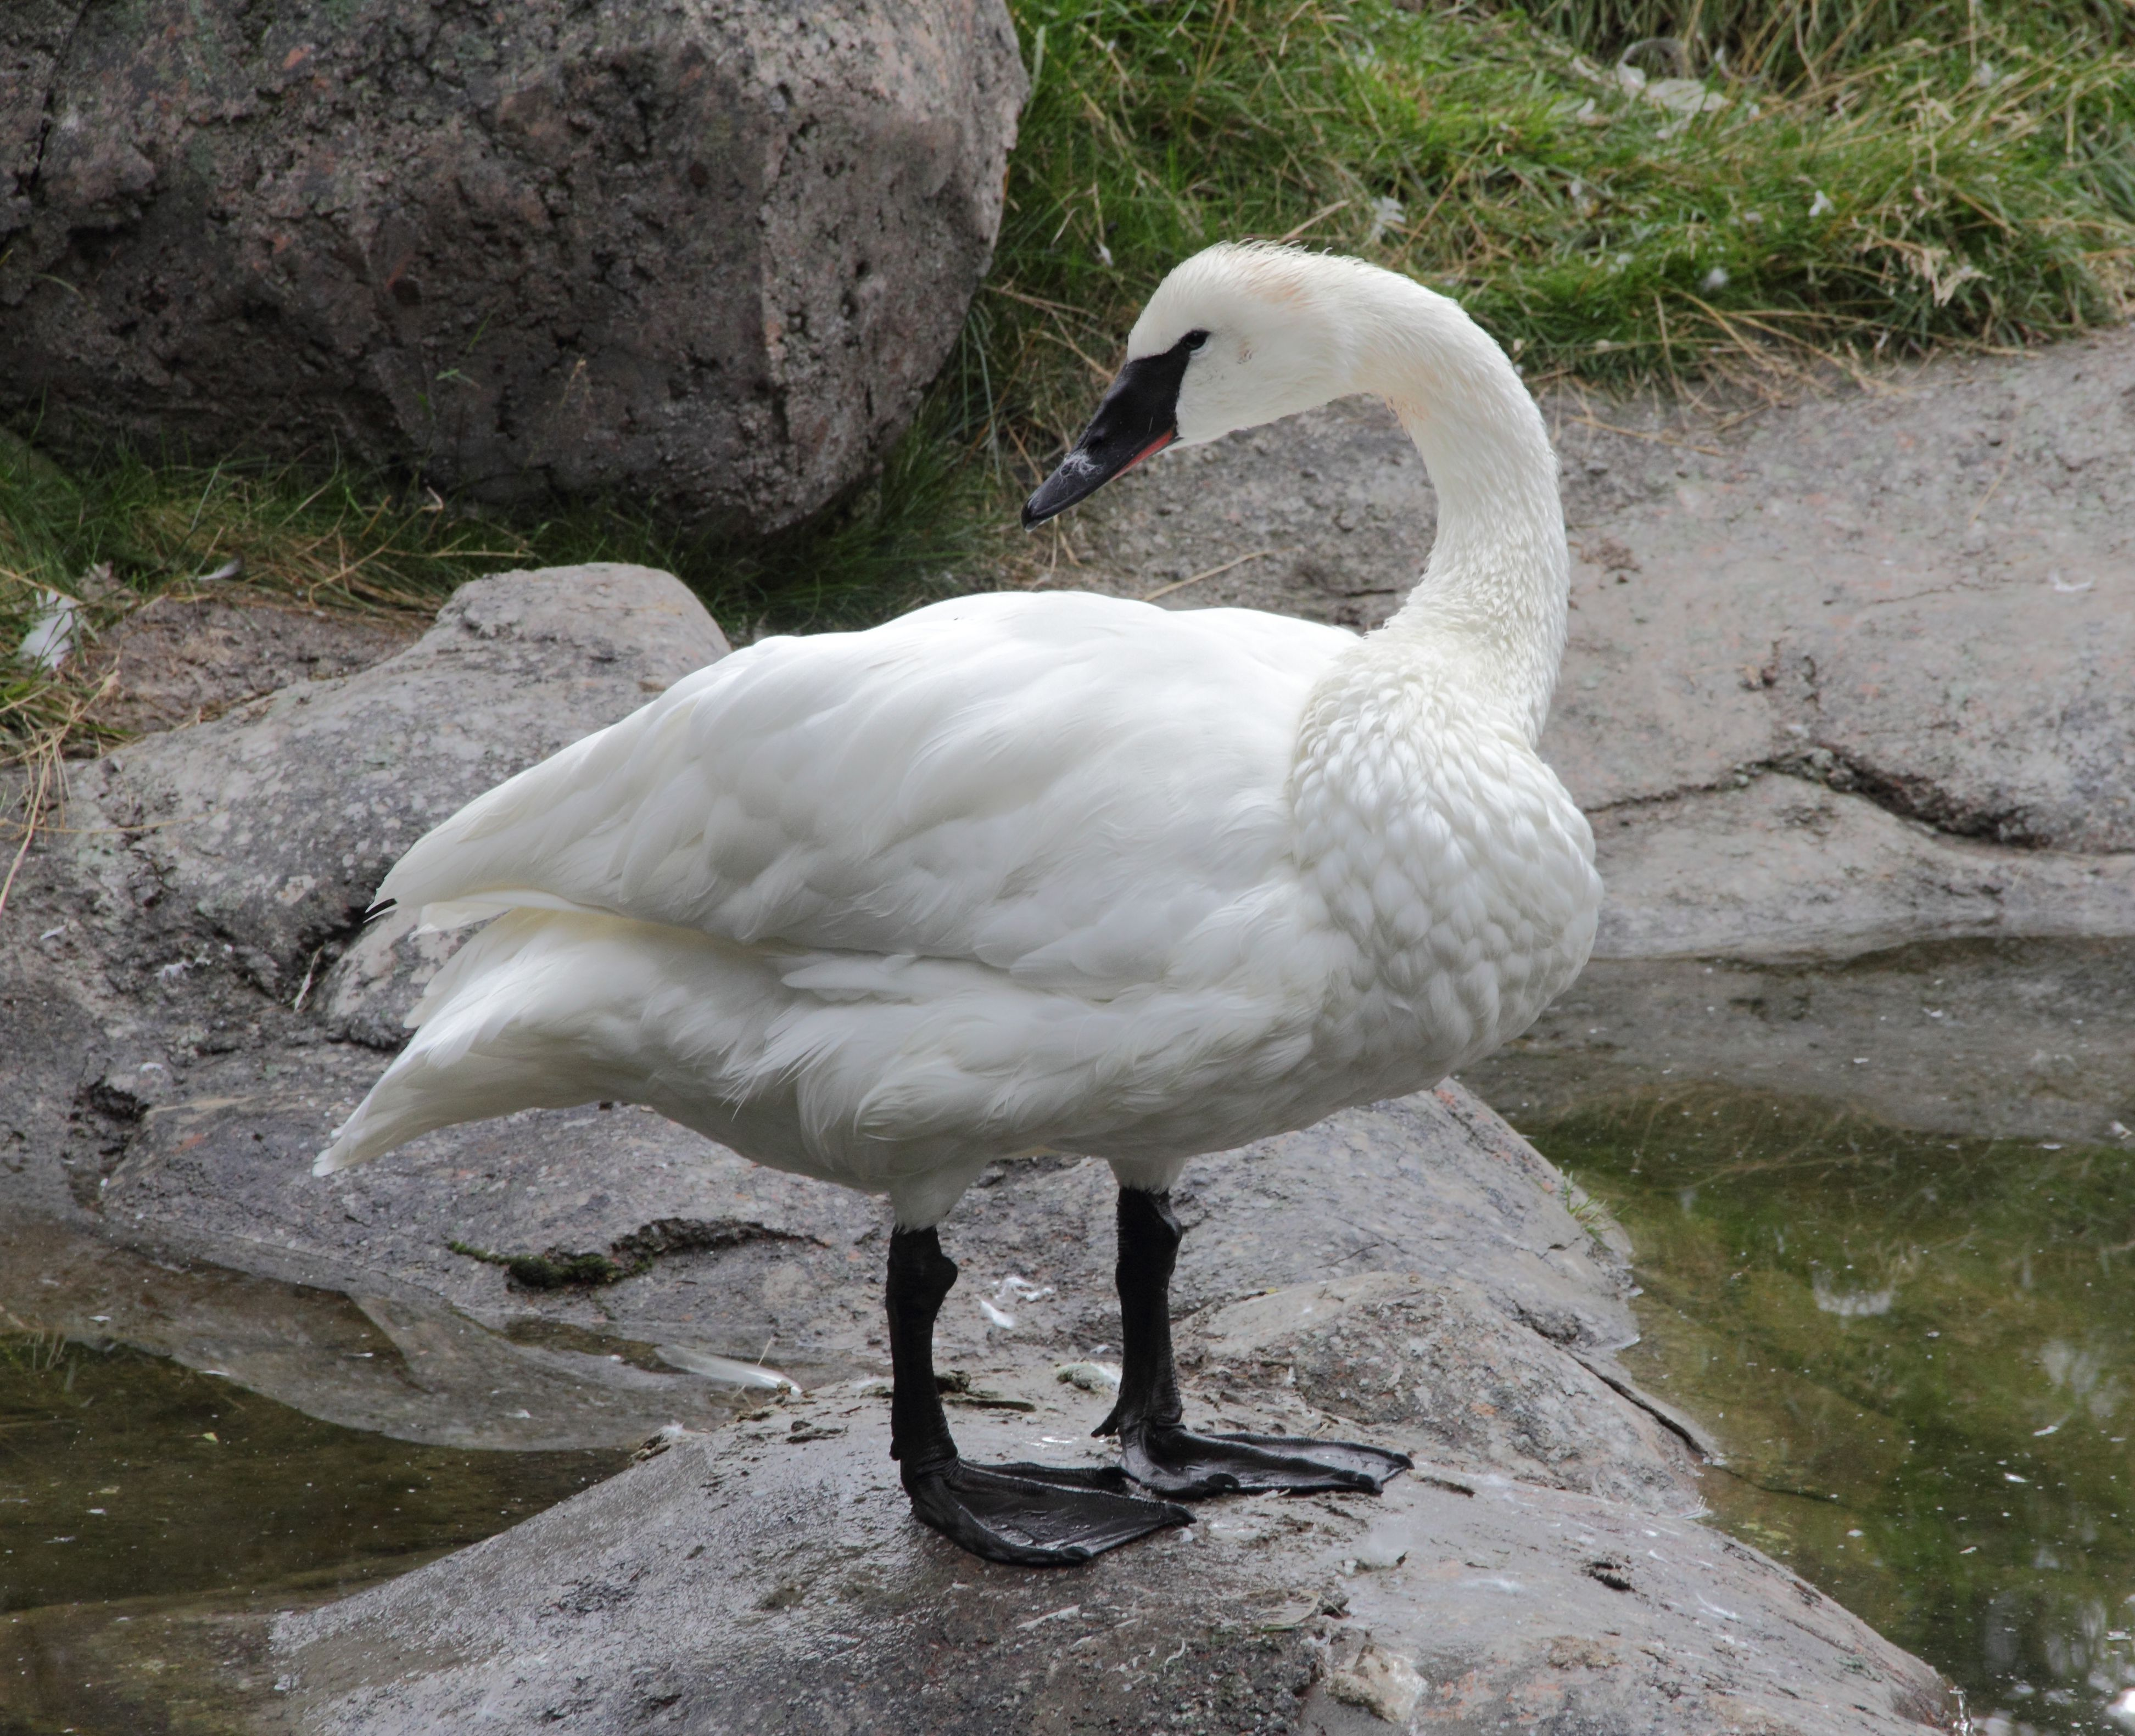 The Trumpeter Swan (Cygnus buccinator) is the heaviest